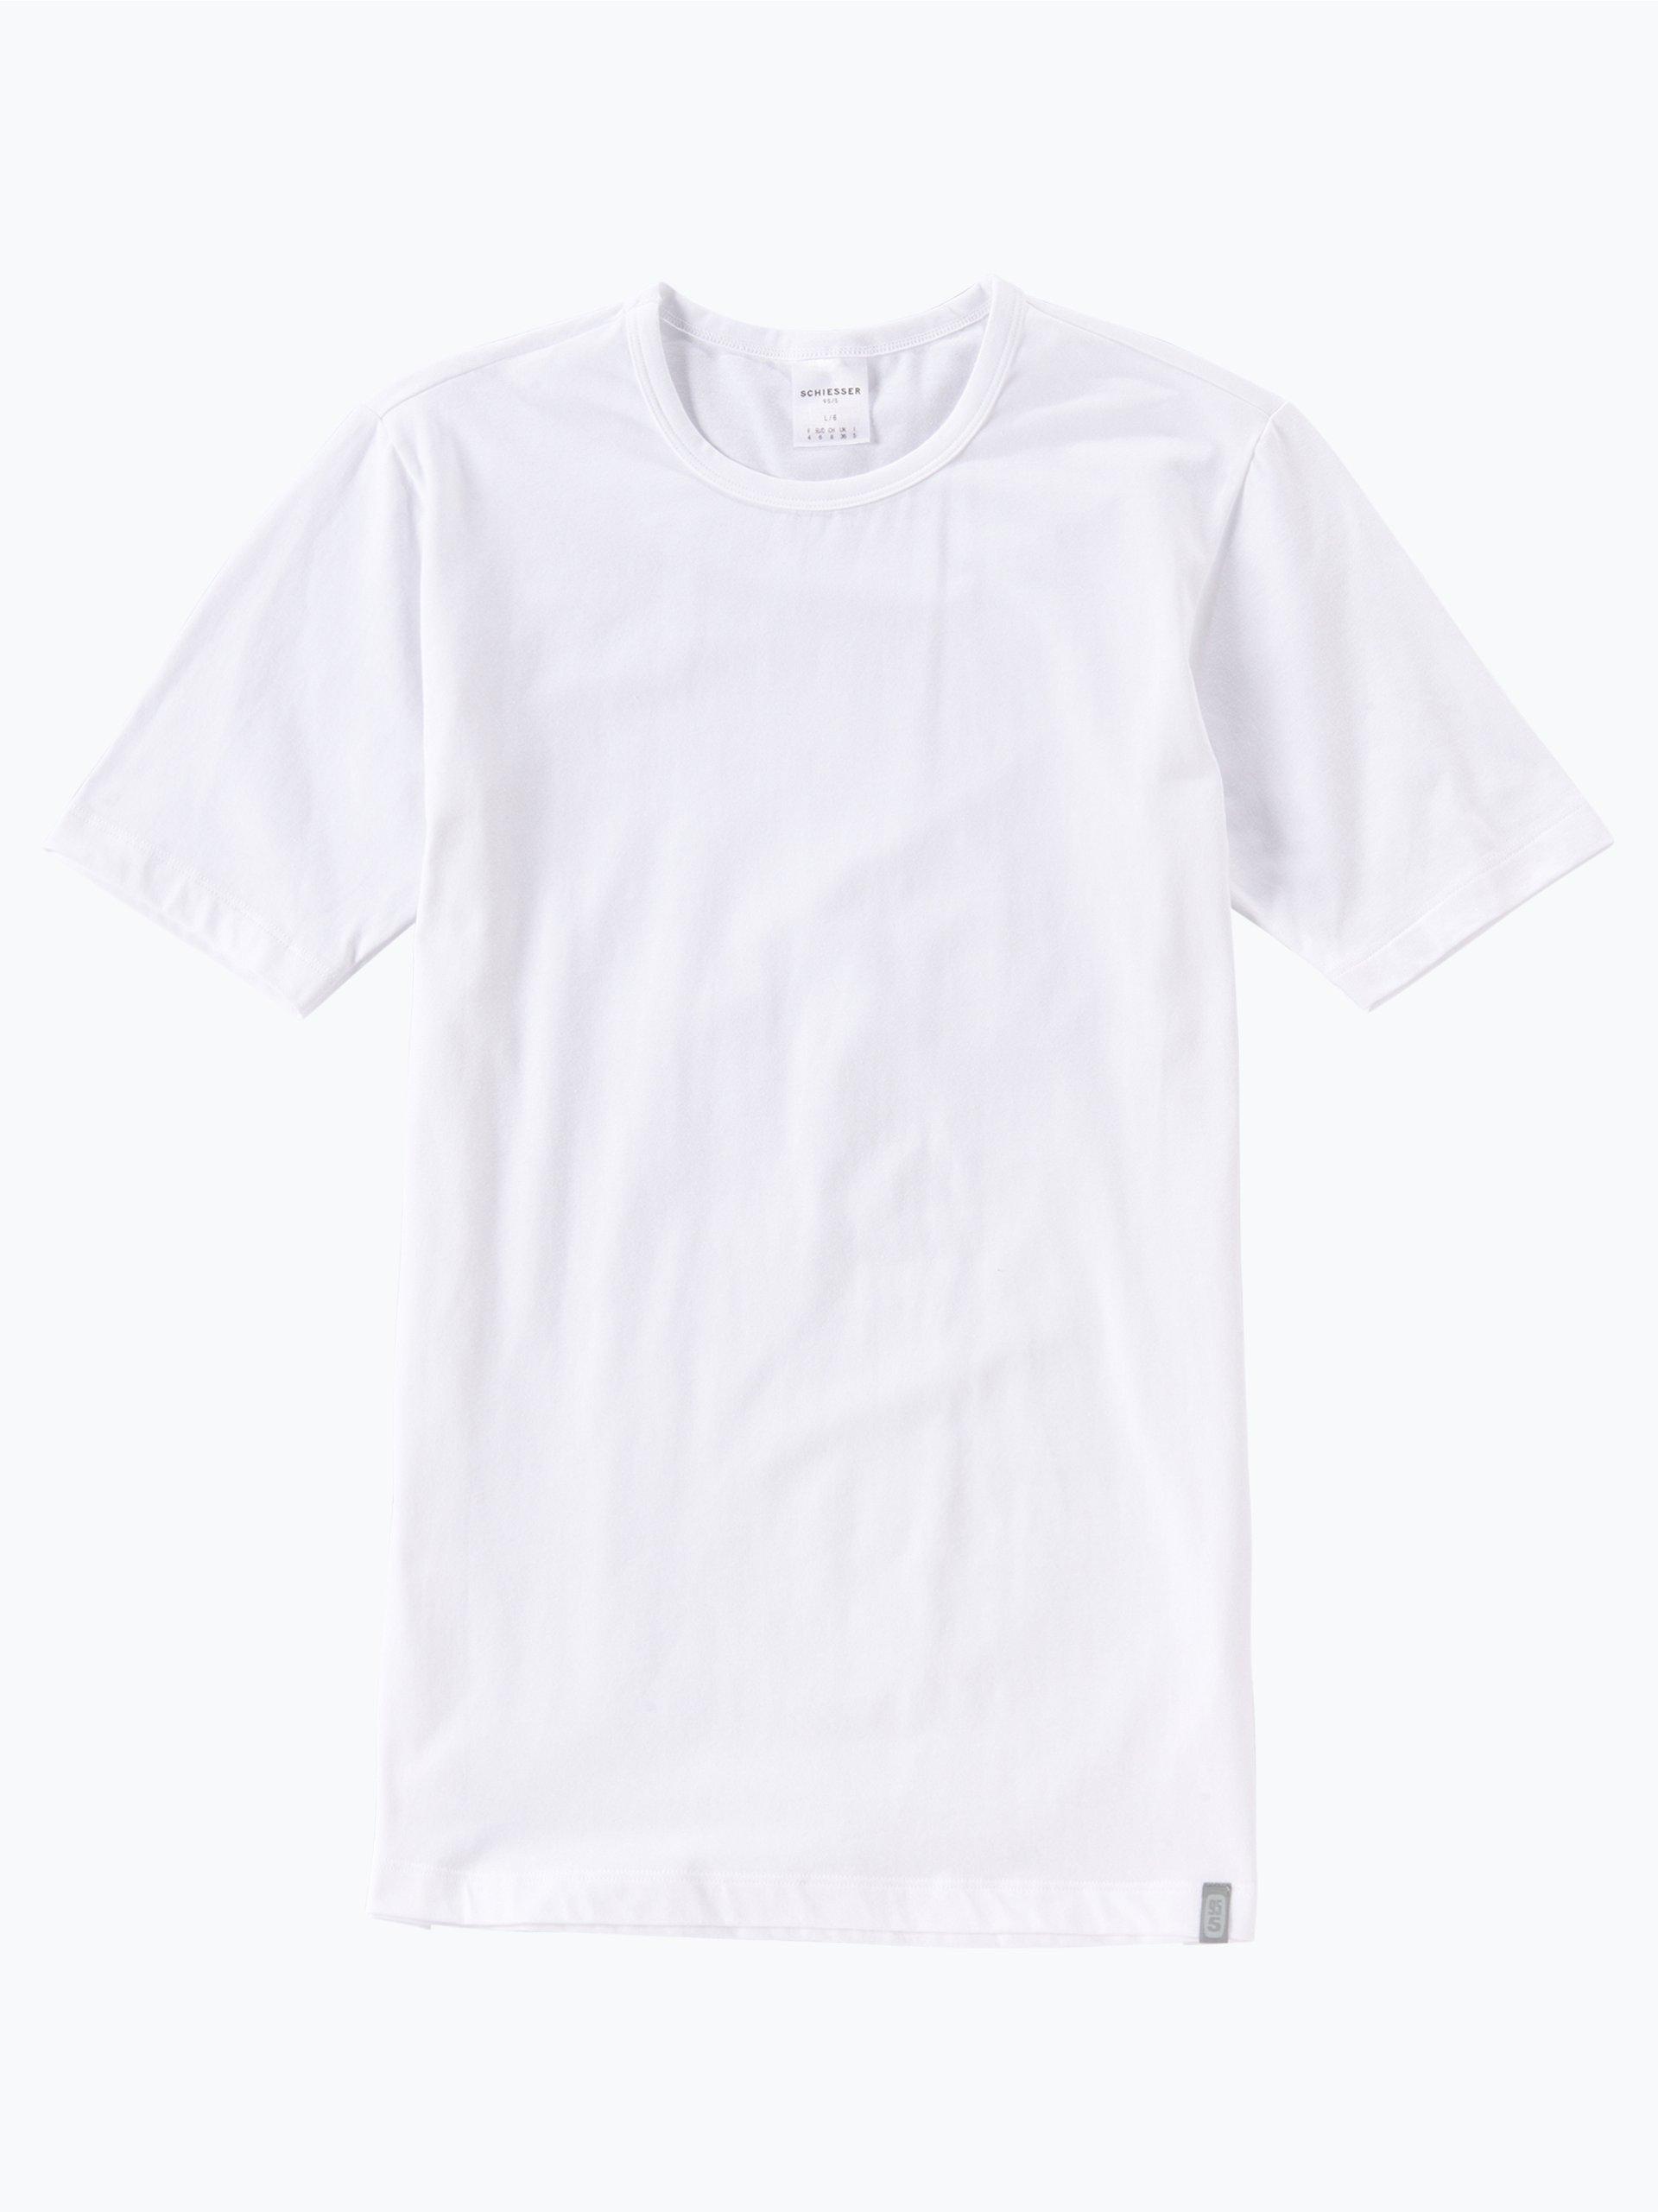 Schiesser Herren T-Shirt - 95/5